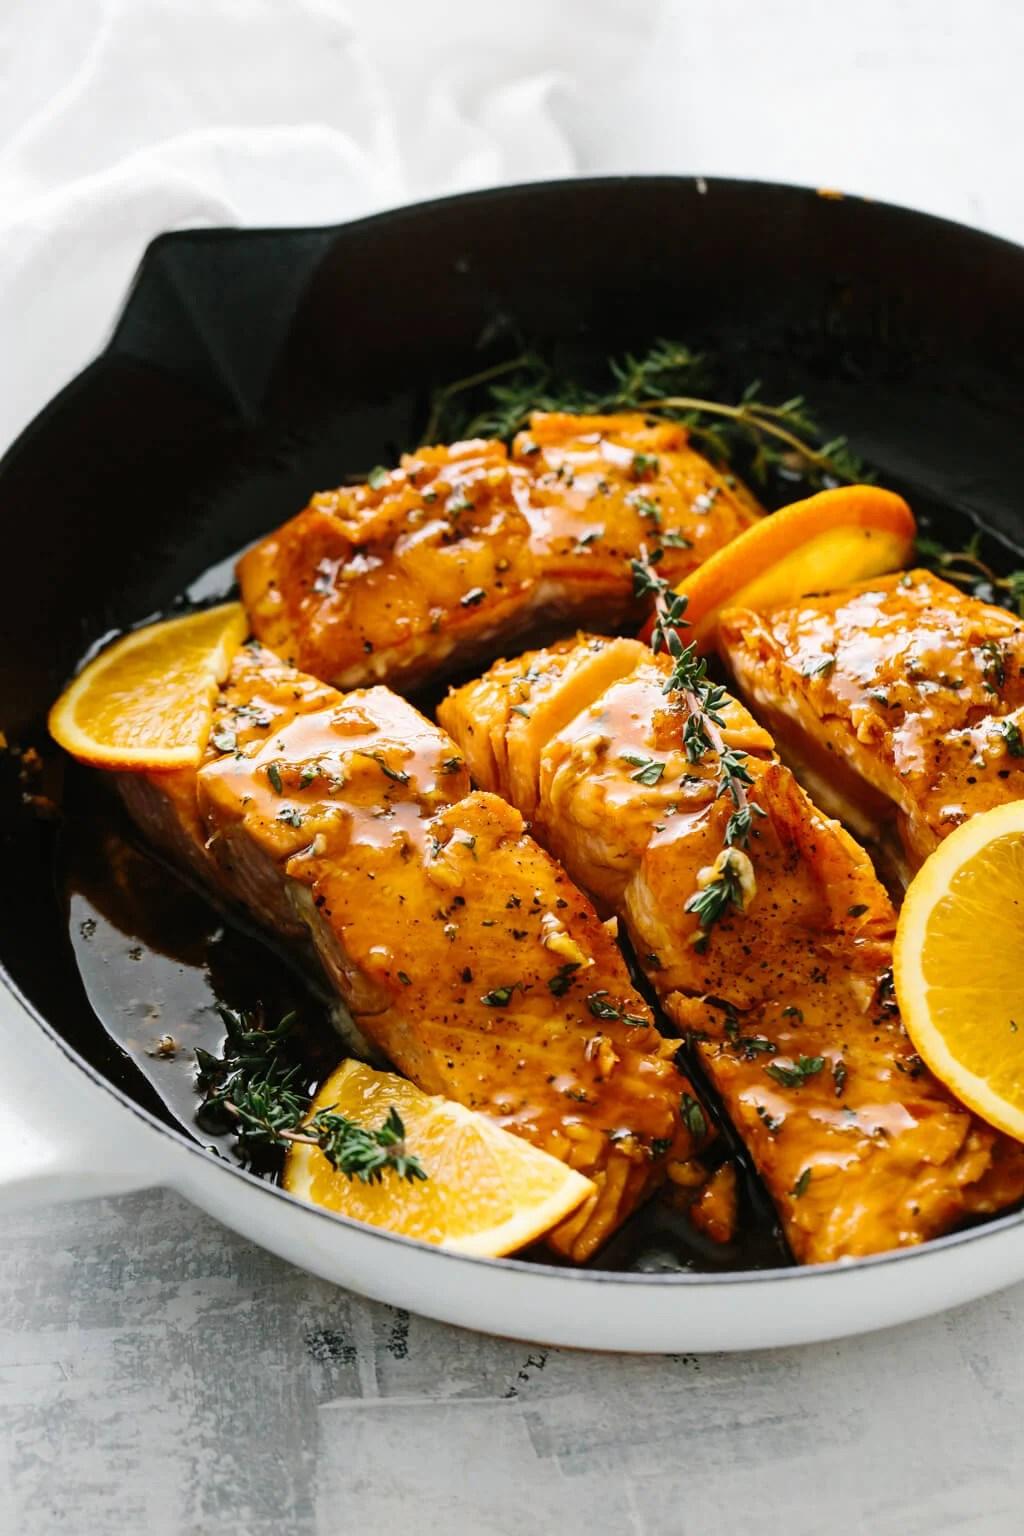 Orange glazed salmon in a pan.